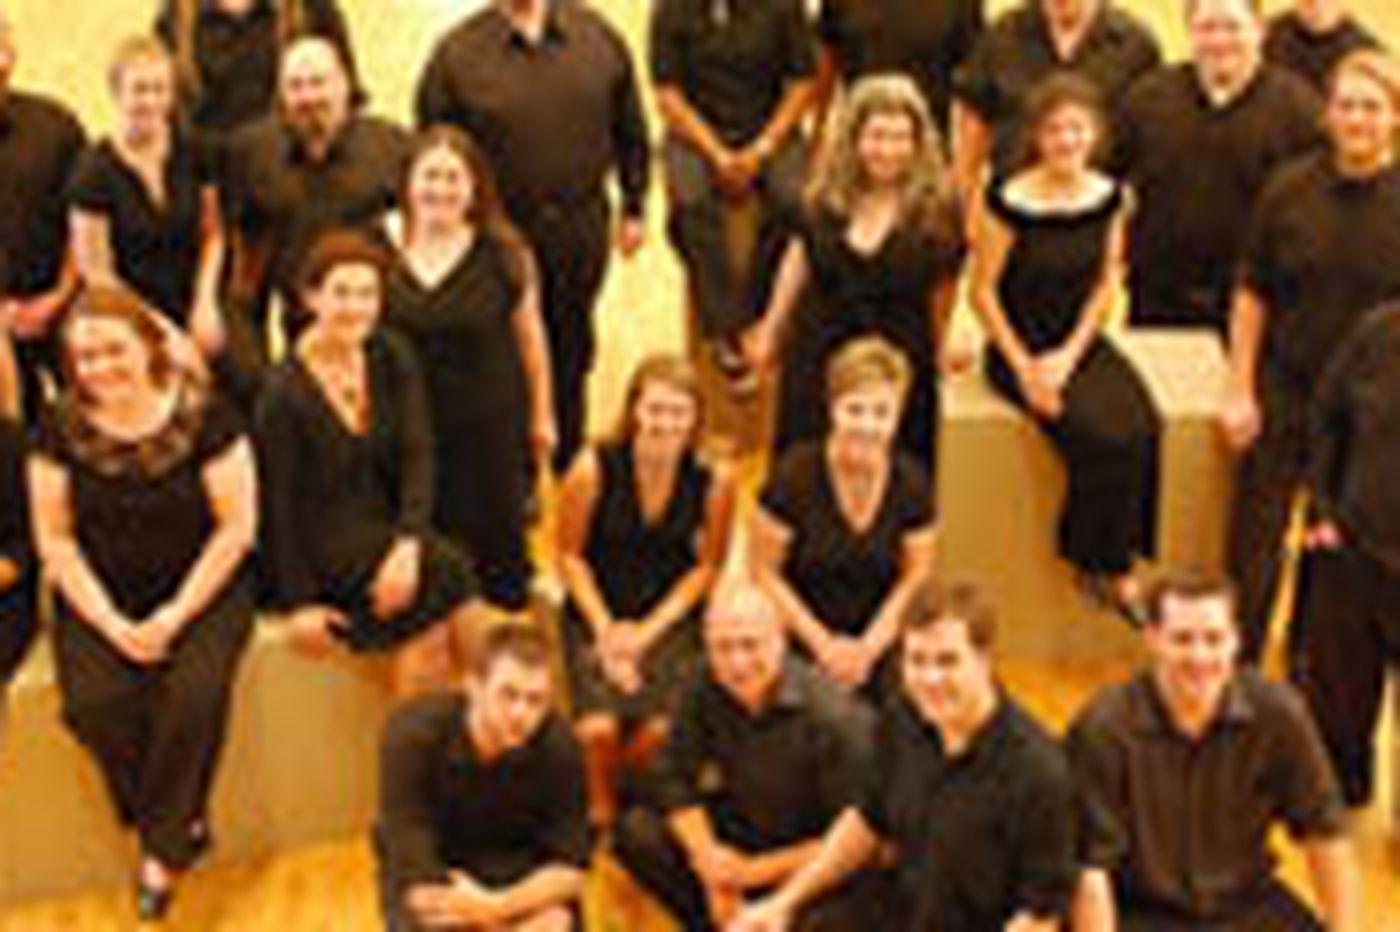 Piffaro, Crossing choir take different routes to seasonal joy